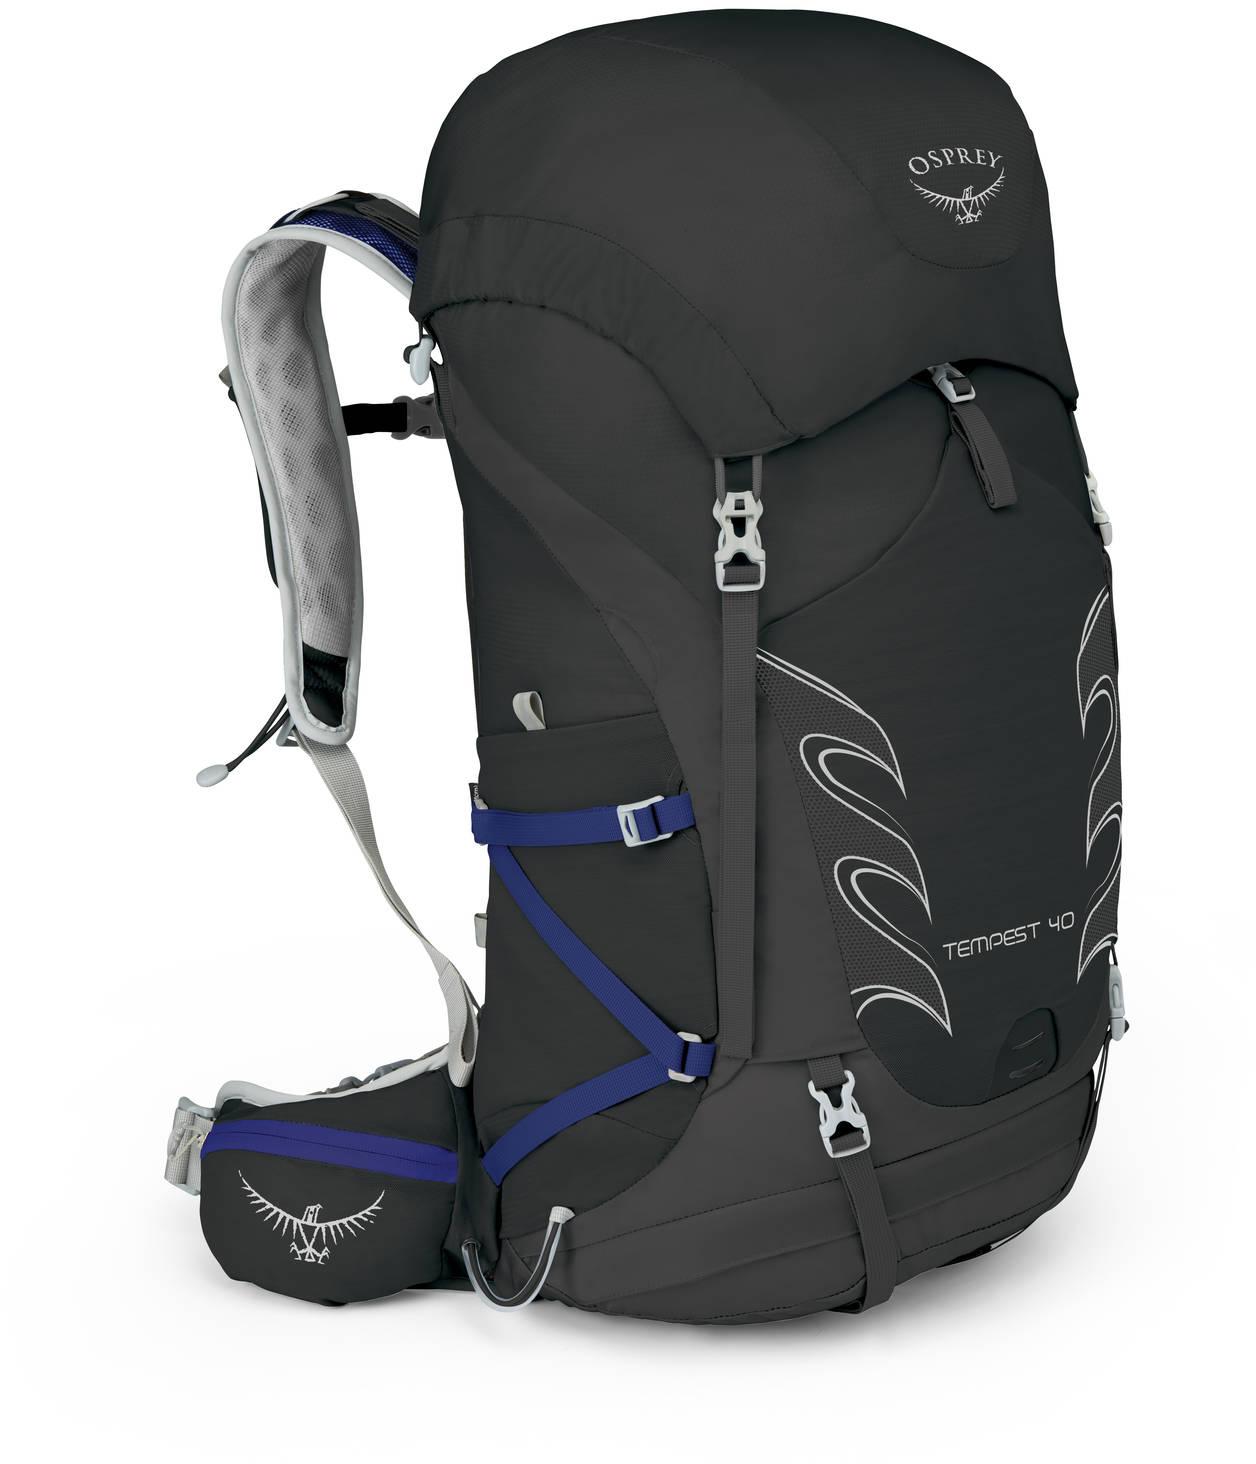 Туристические рюкзаки Рюкзак Osprey Tempest 40 Tempest_40_S17_Side_Black_web.jpg